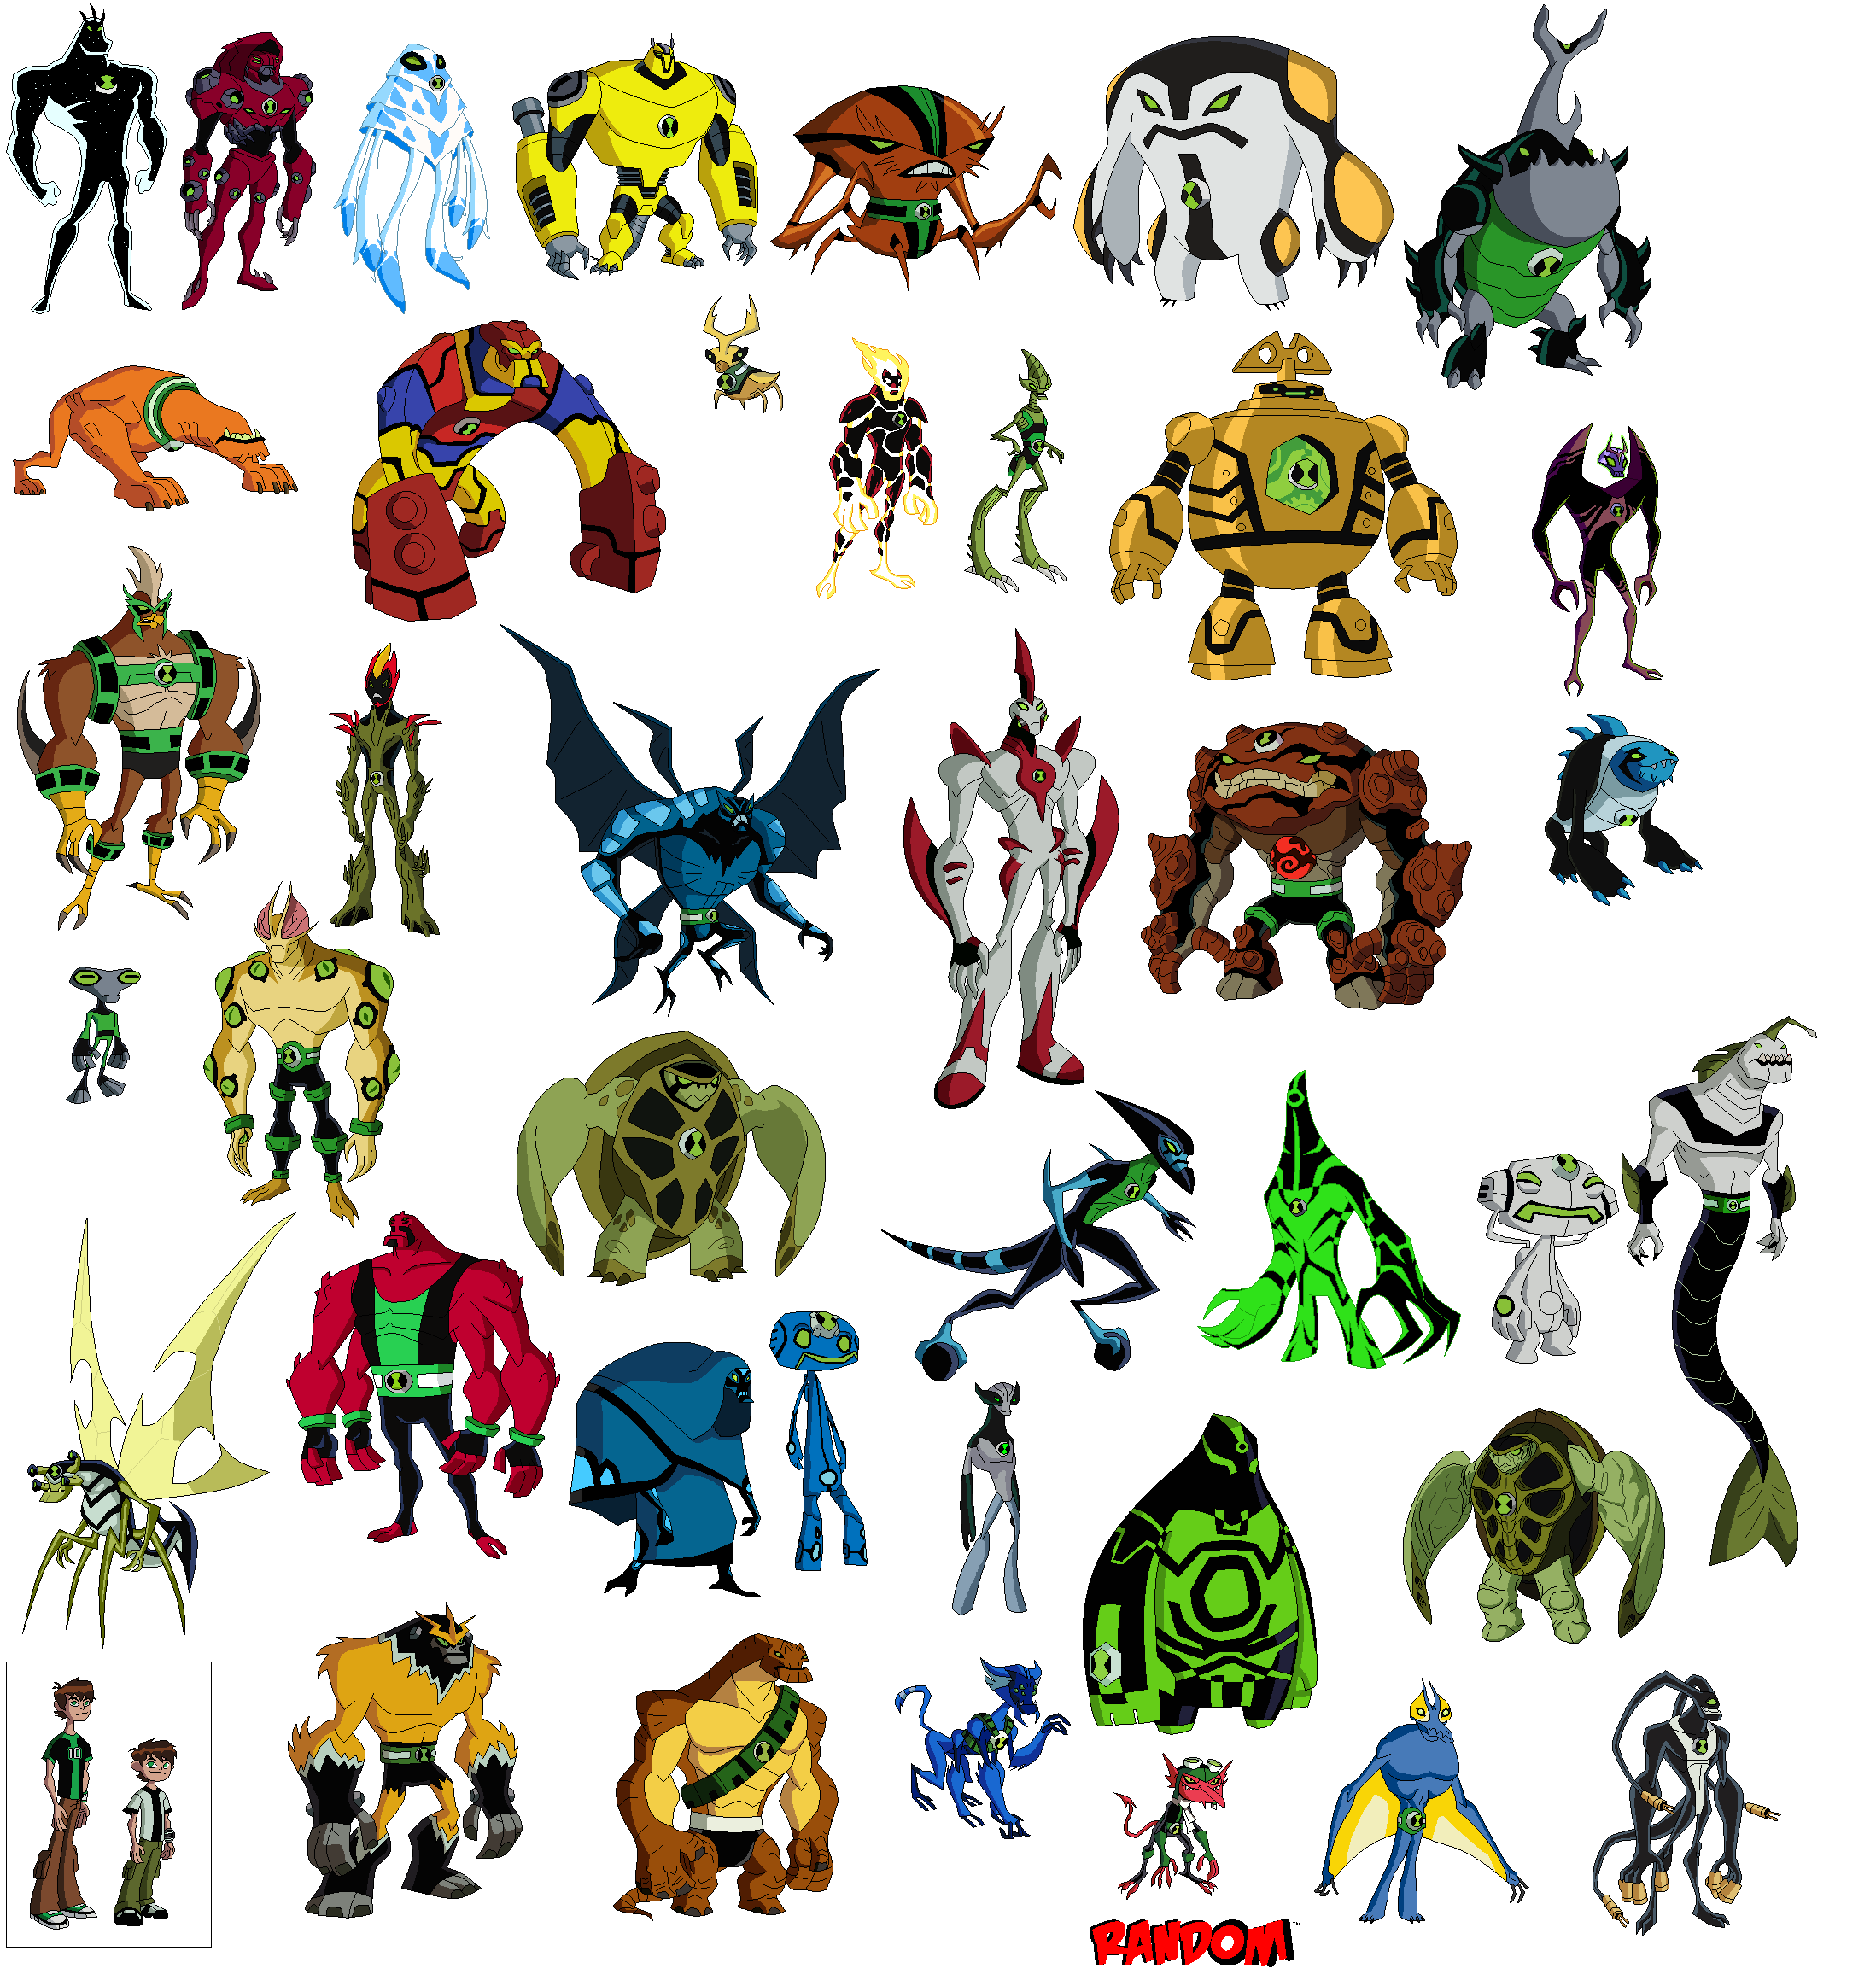 Imagem todos os aliens omniverseg universo ben 10 fandom todos os aliens omniverseg voltagebd Images